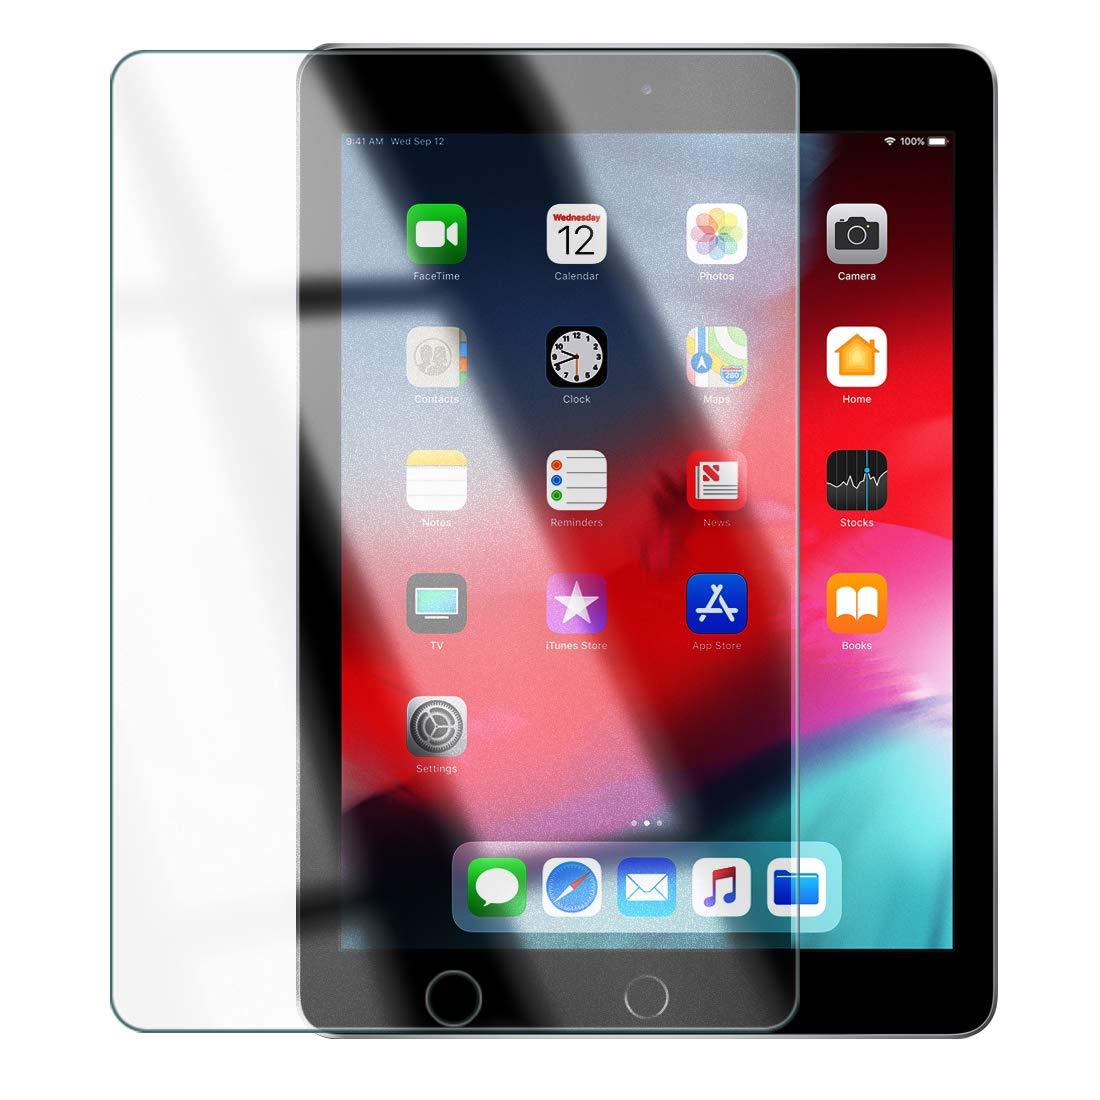 iPad 9.7インチ対応 【ゲーム快適サラサラ度UP】 O型 反射低減 アンチグレア + ペーパーライク 中間感触 絶妙サイズ ガラスフィルム 指紋防止 O型 2018 2017 新型 第6世代 Air2 iPadPro iPadAir ApplePencil(第1世代)対応 強化ガラス 強化ガラスフィルム 保護フィルム 液晶保護フィルム 荒野行動 対応 保護 ガラス フィルム 全面保護 ケース 衝撃 軽量 薄型 レザー 3D タッチ 薄型 手帳 カバー 対応 気泡防止 日本製 【WANLOK】9H 2.5D 0.3mm iPad5 iPad6 AG